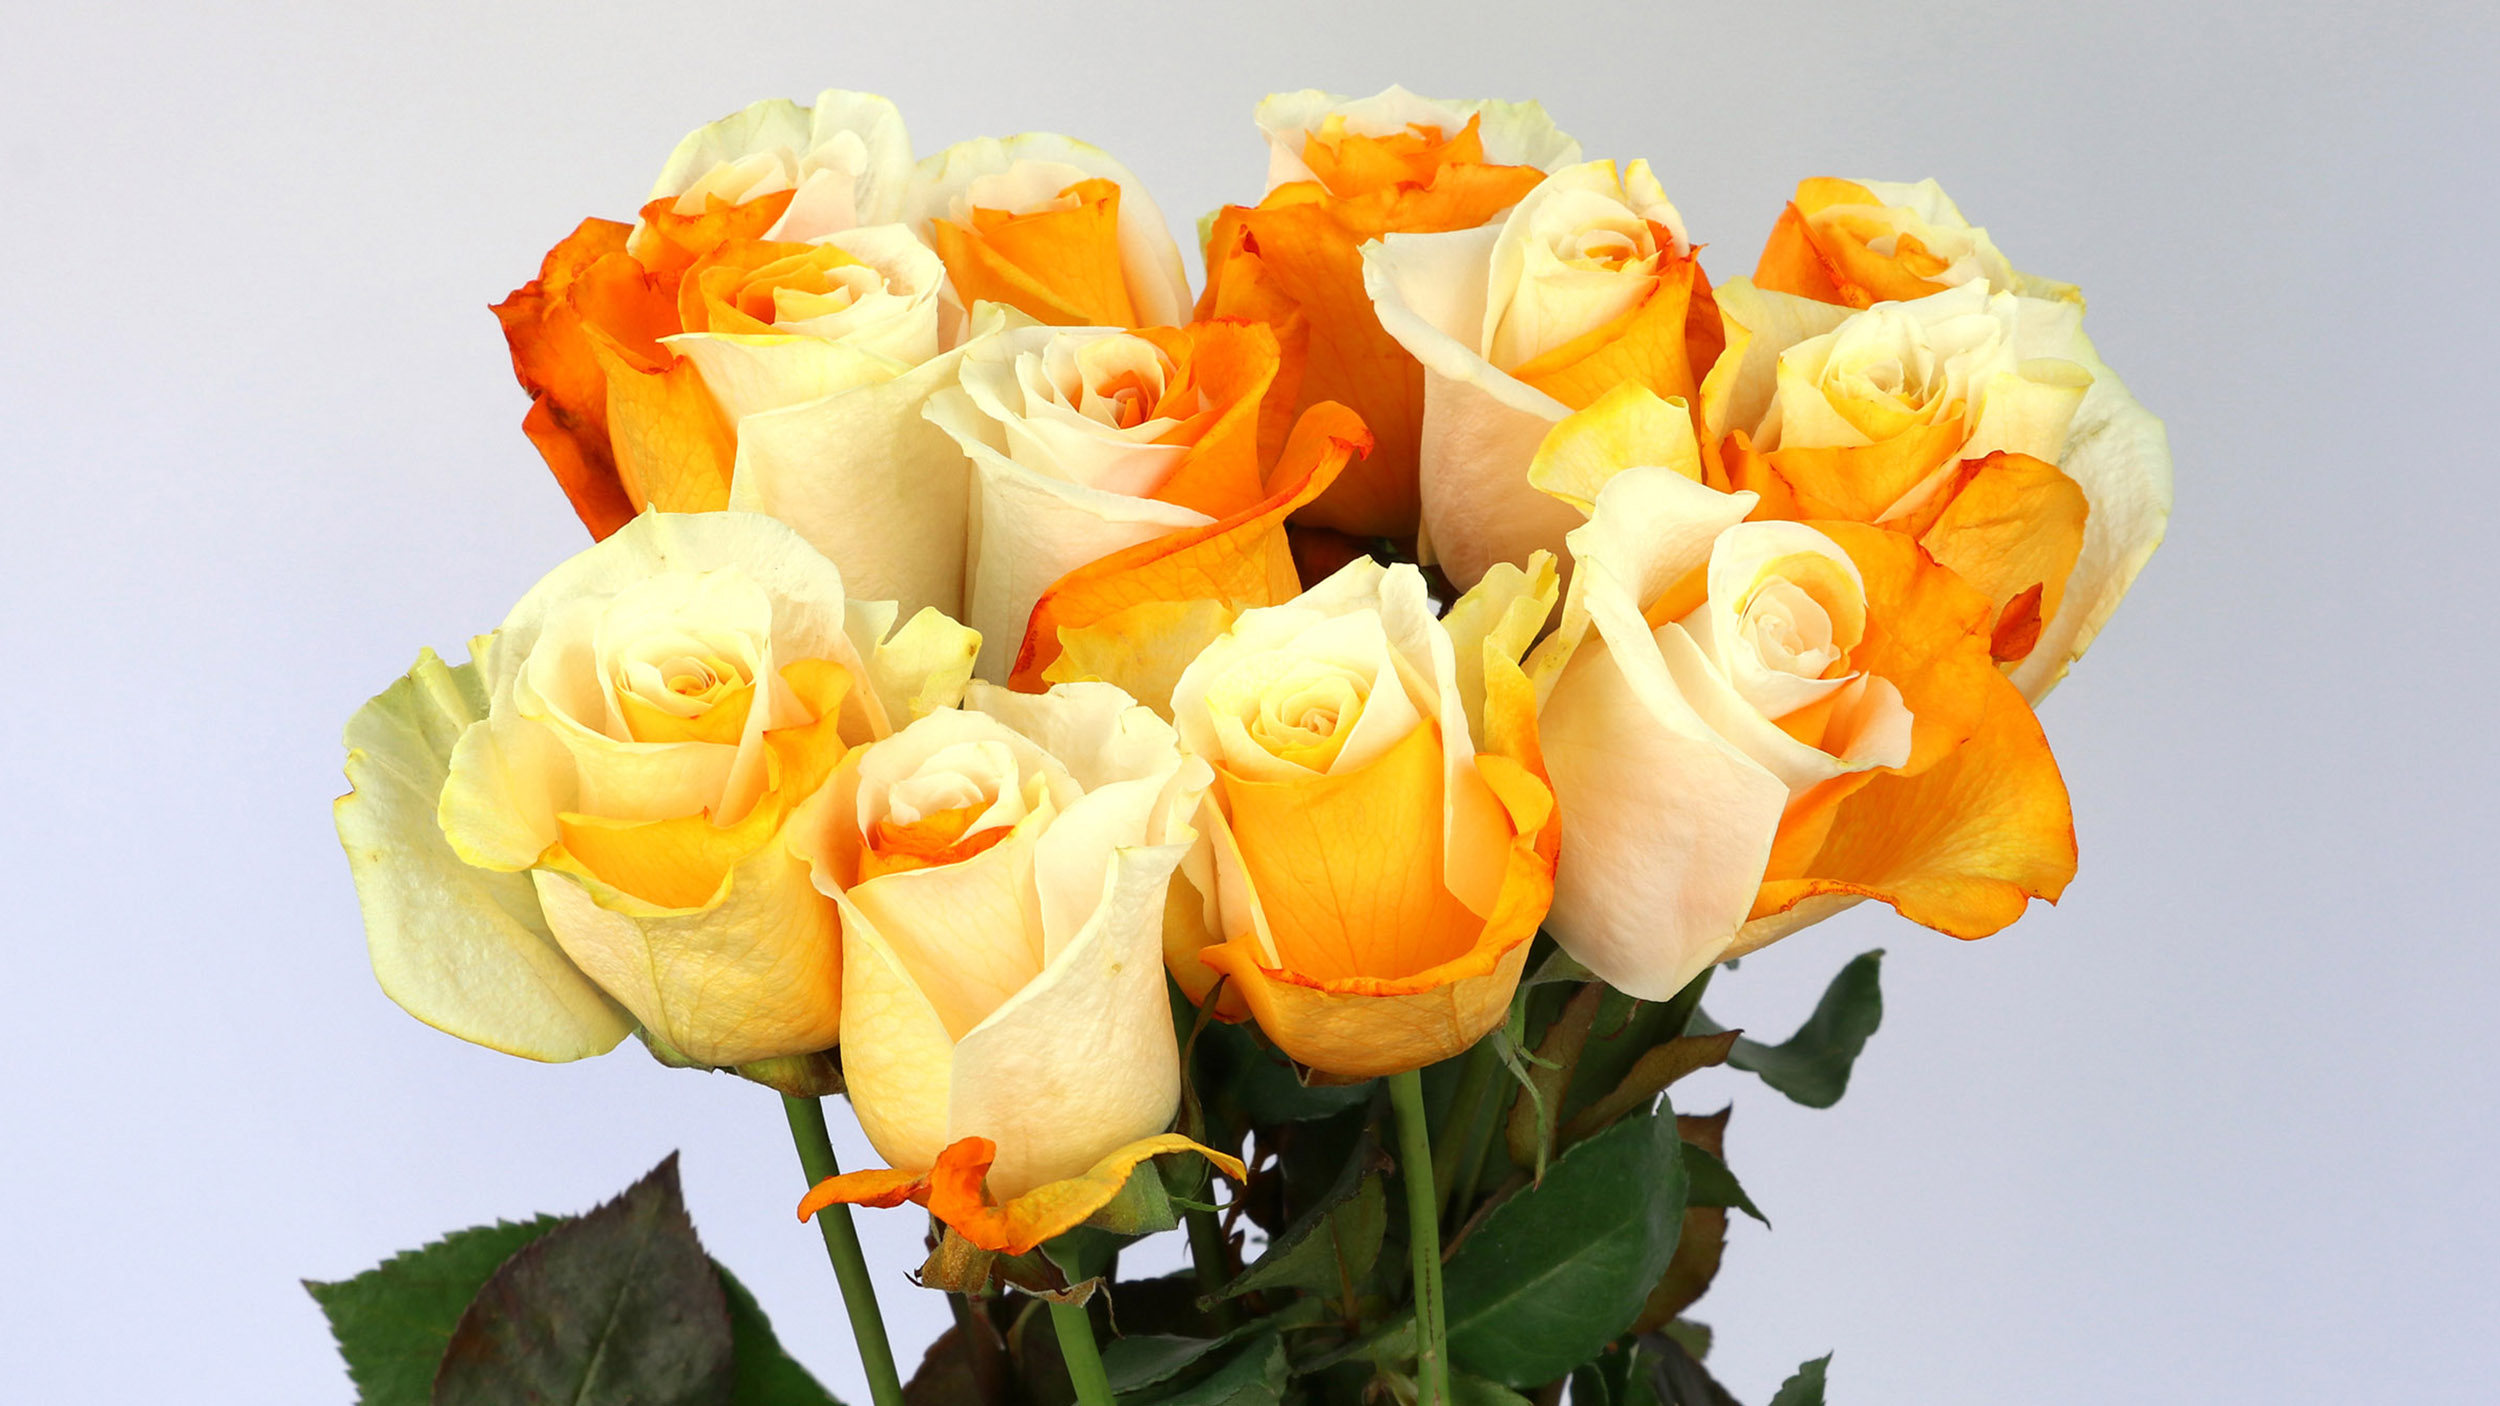 We Build Communication - Barile Flowers